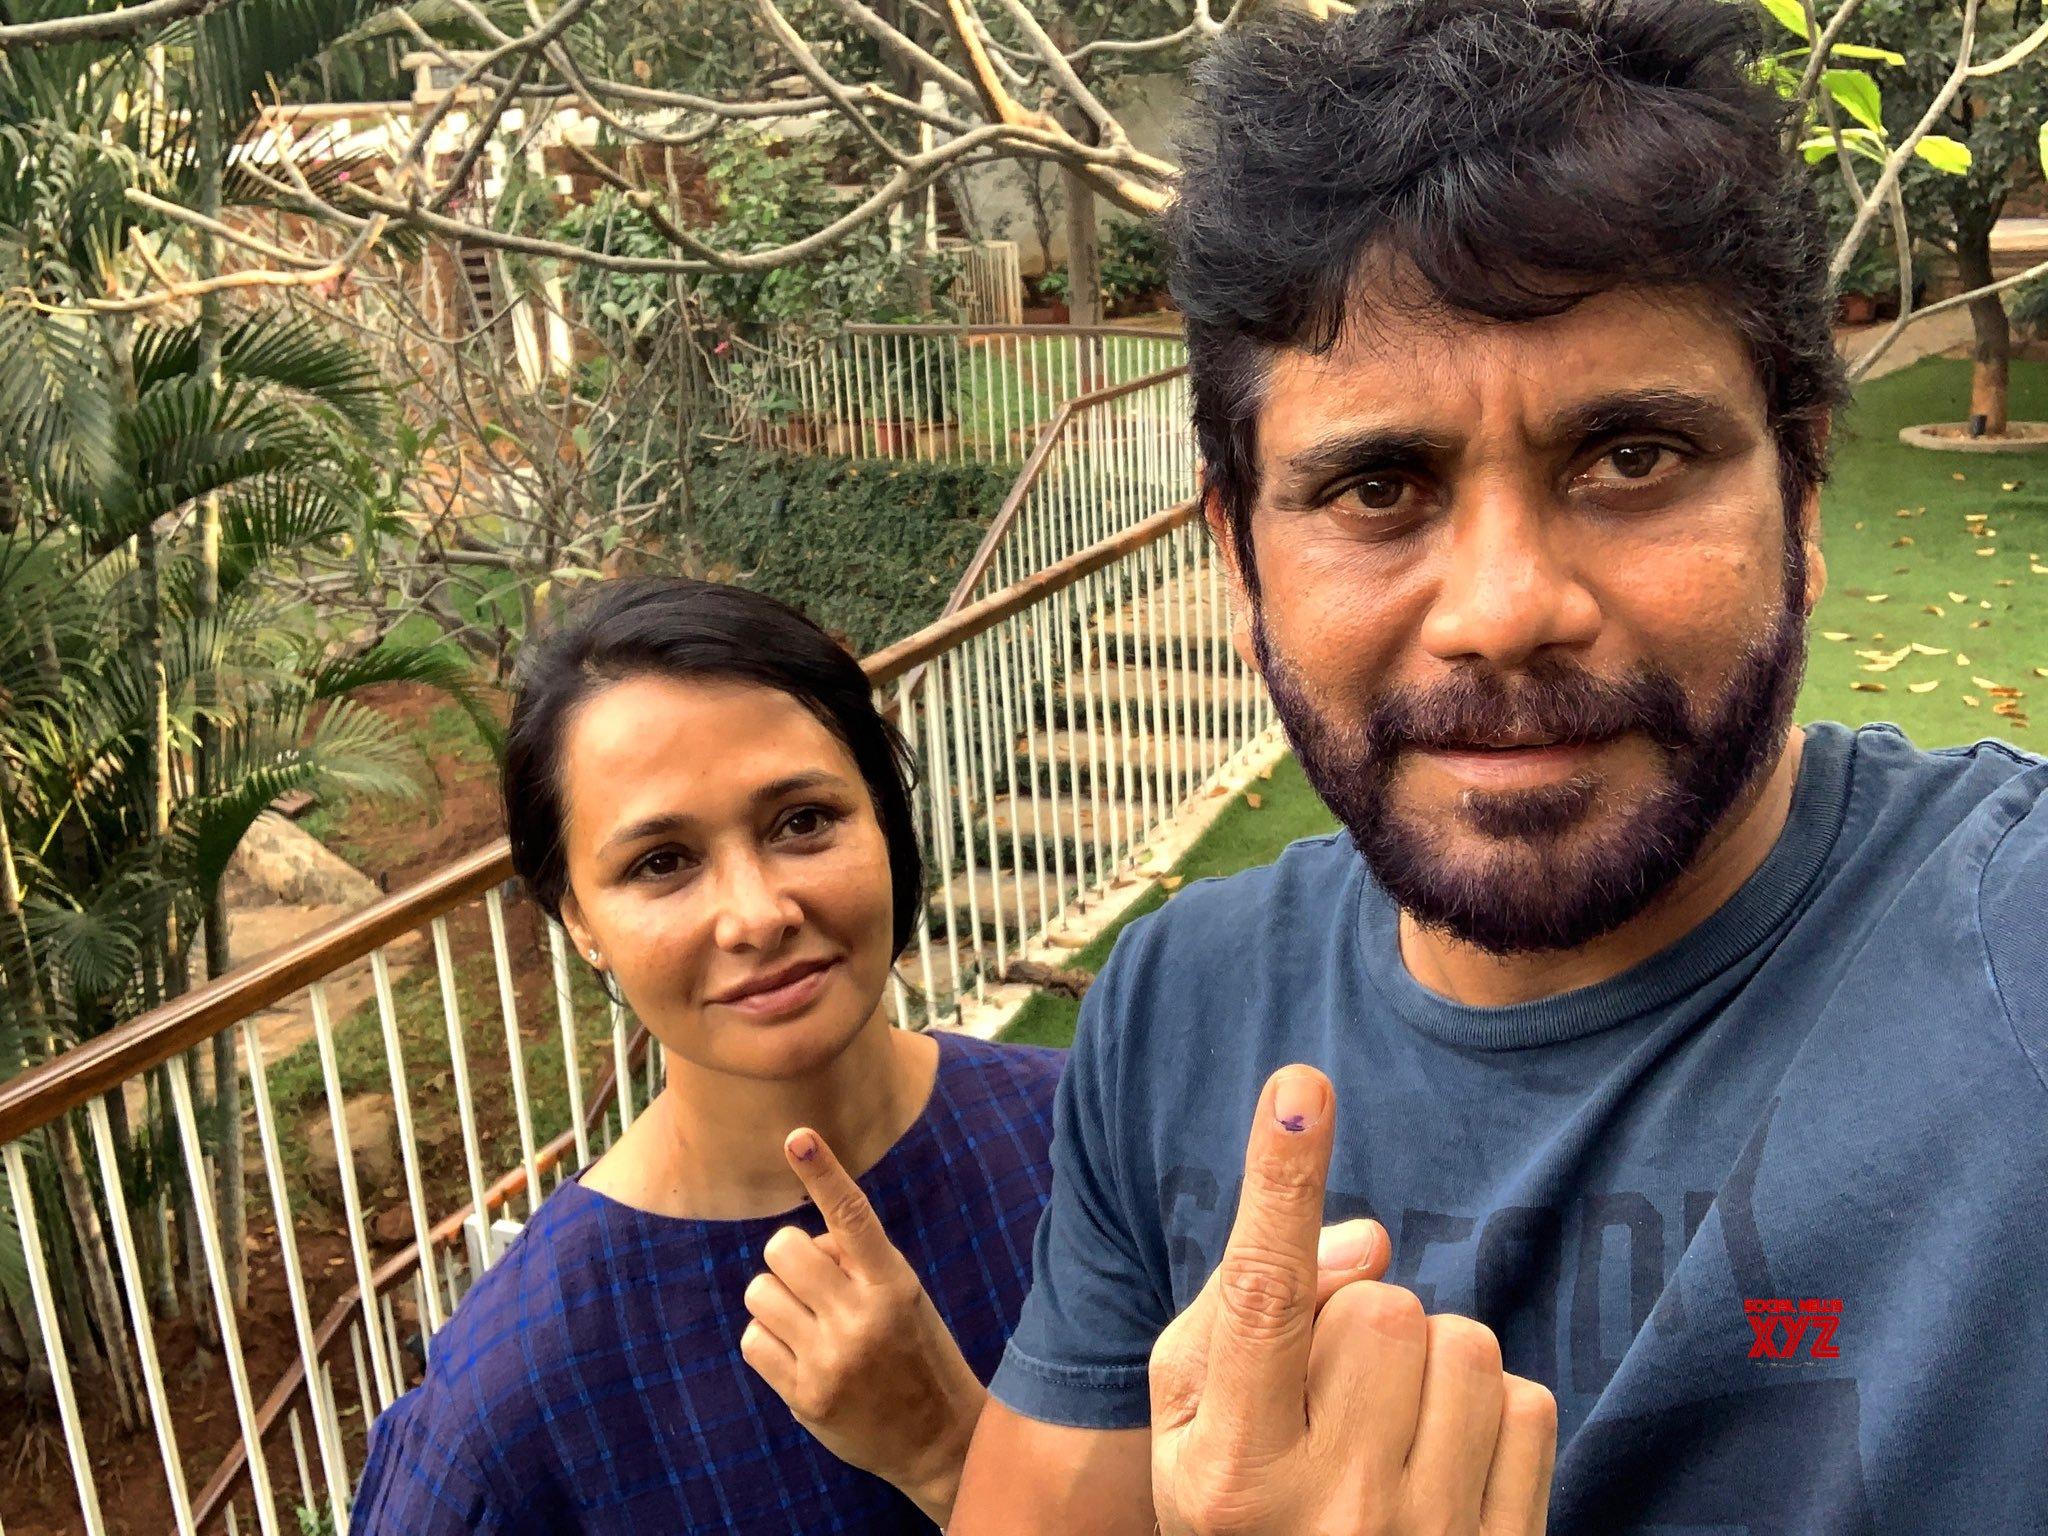 Nagarjuna And Amala Still After Casting Their Vote